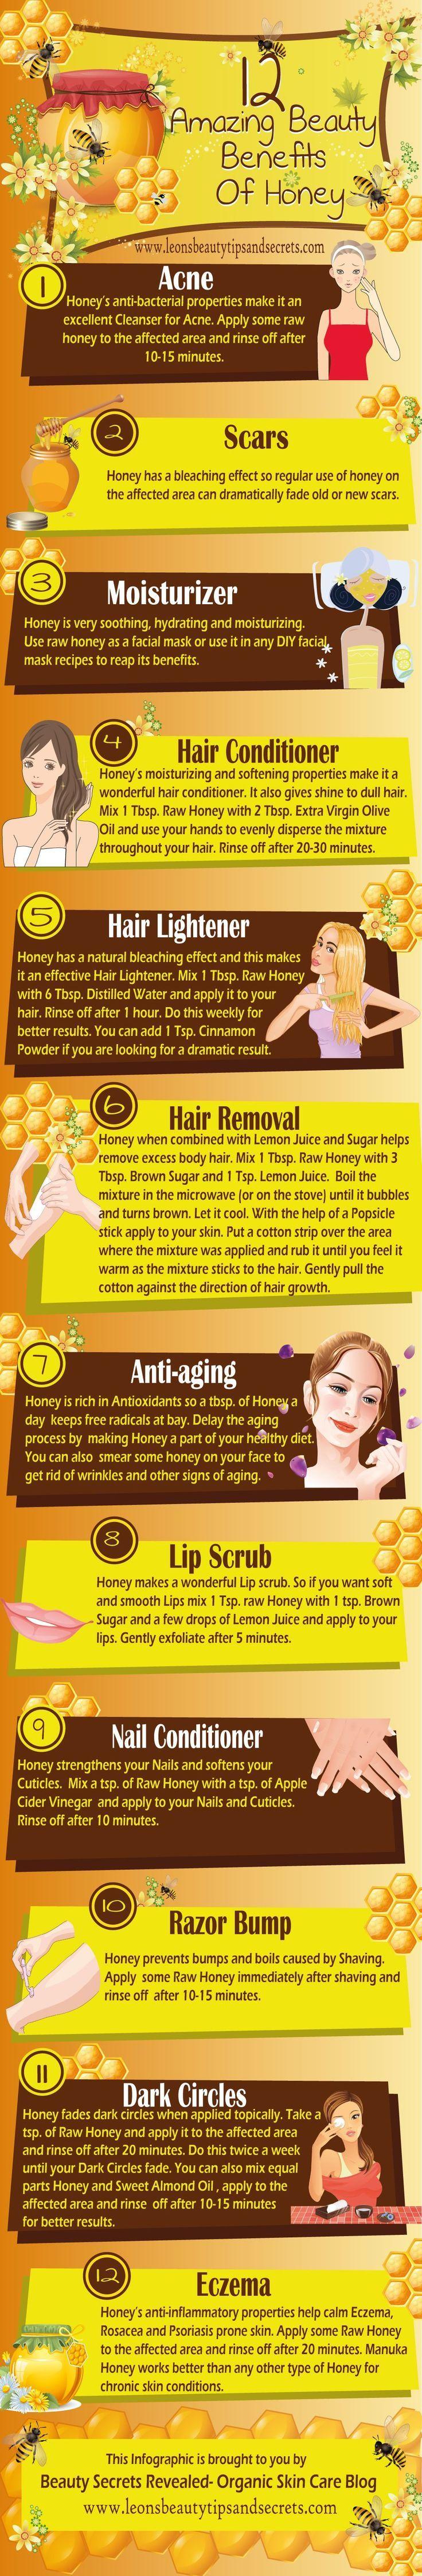 12 Amazing Beauty Benefits Of Honey Honey for eczema, acne, hair, wrinkles, scars, dark circles